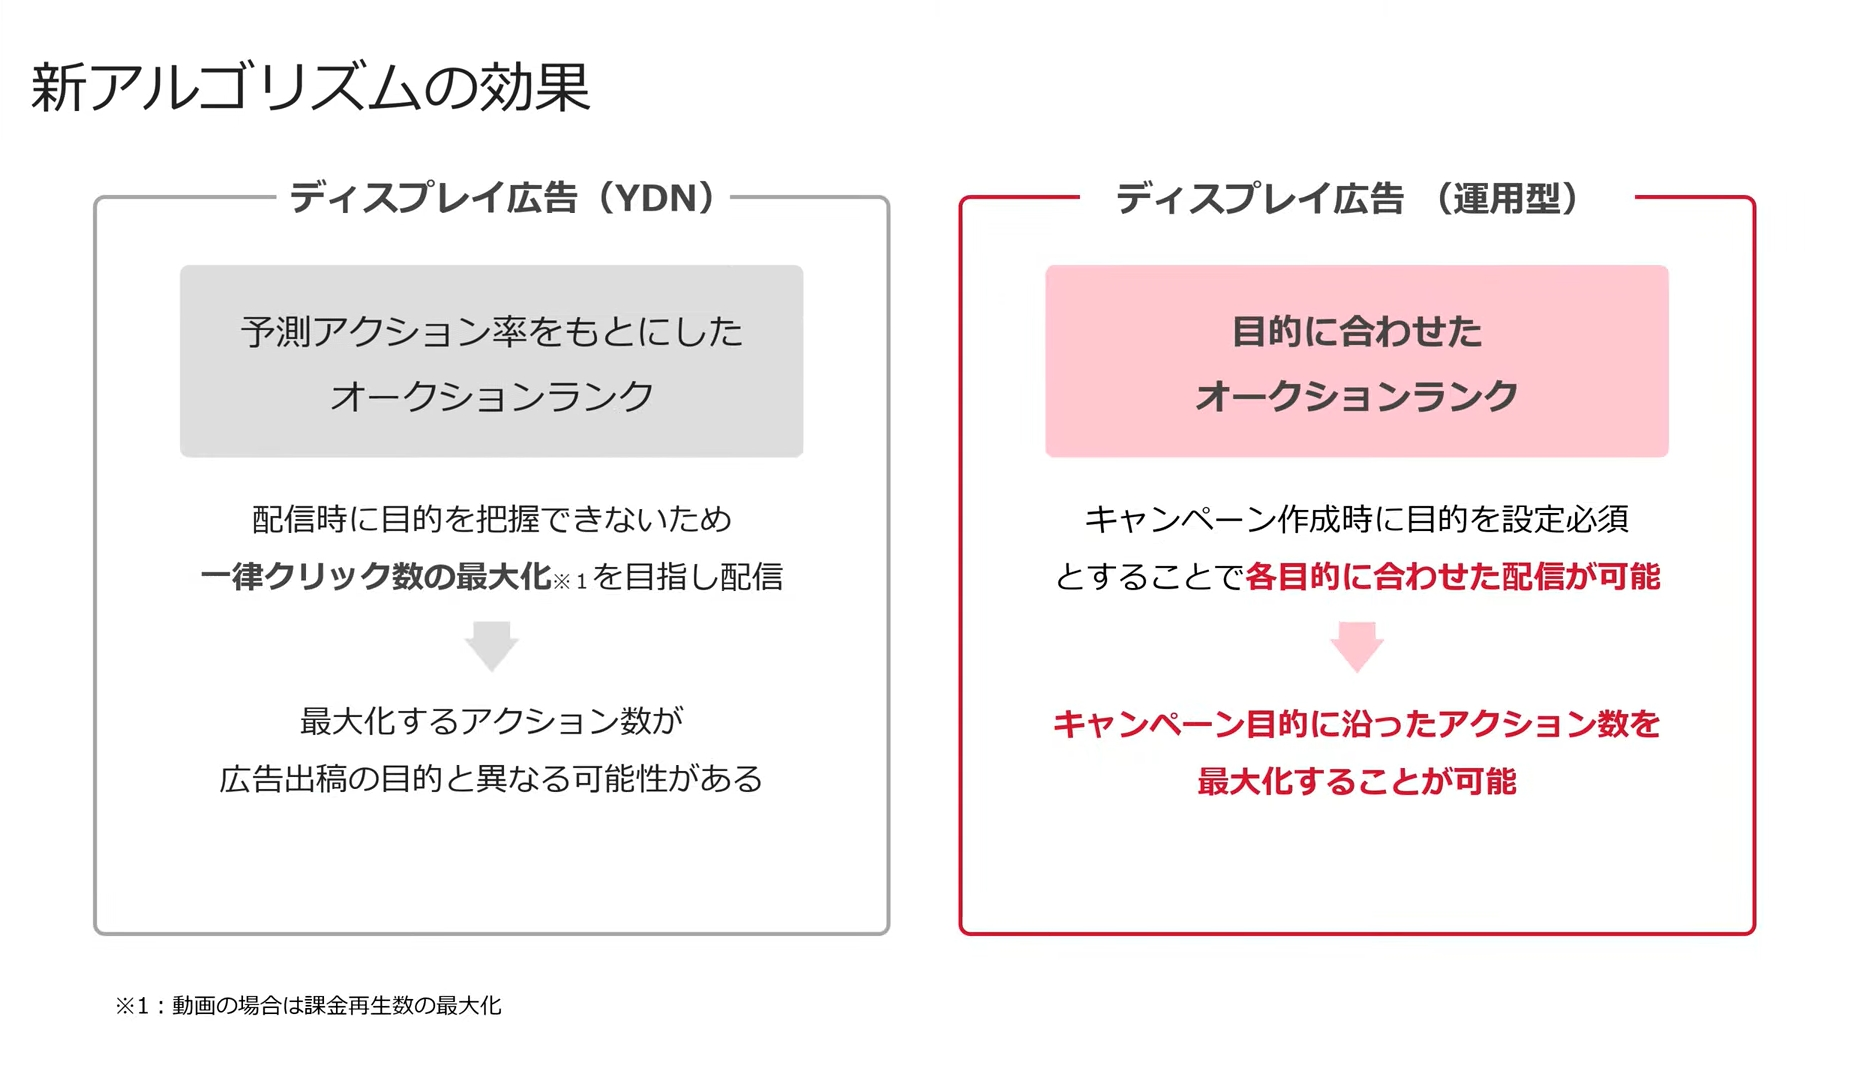 【Yahoo!広告 ディスプレイ広告(運用型)】<br>~仕組み・概要と効果的な運用方法を元整備士が考察!~